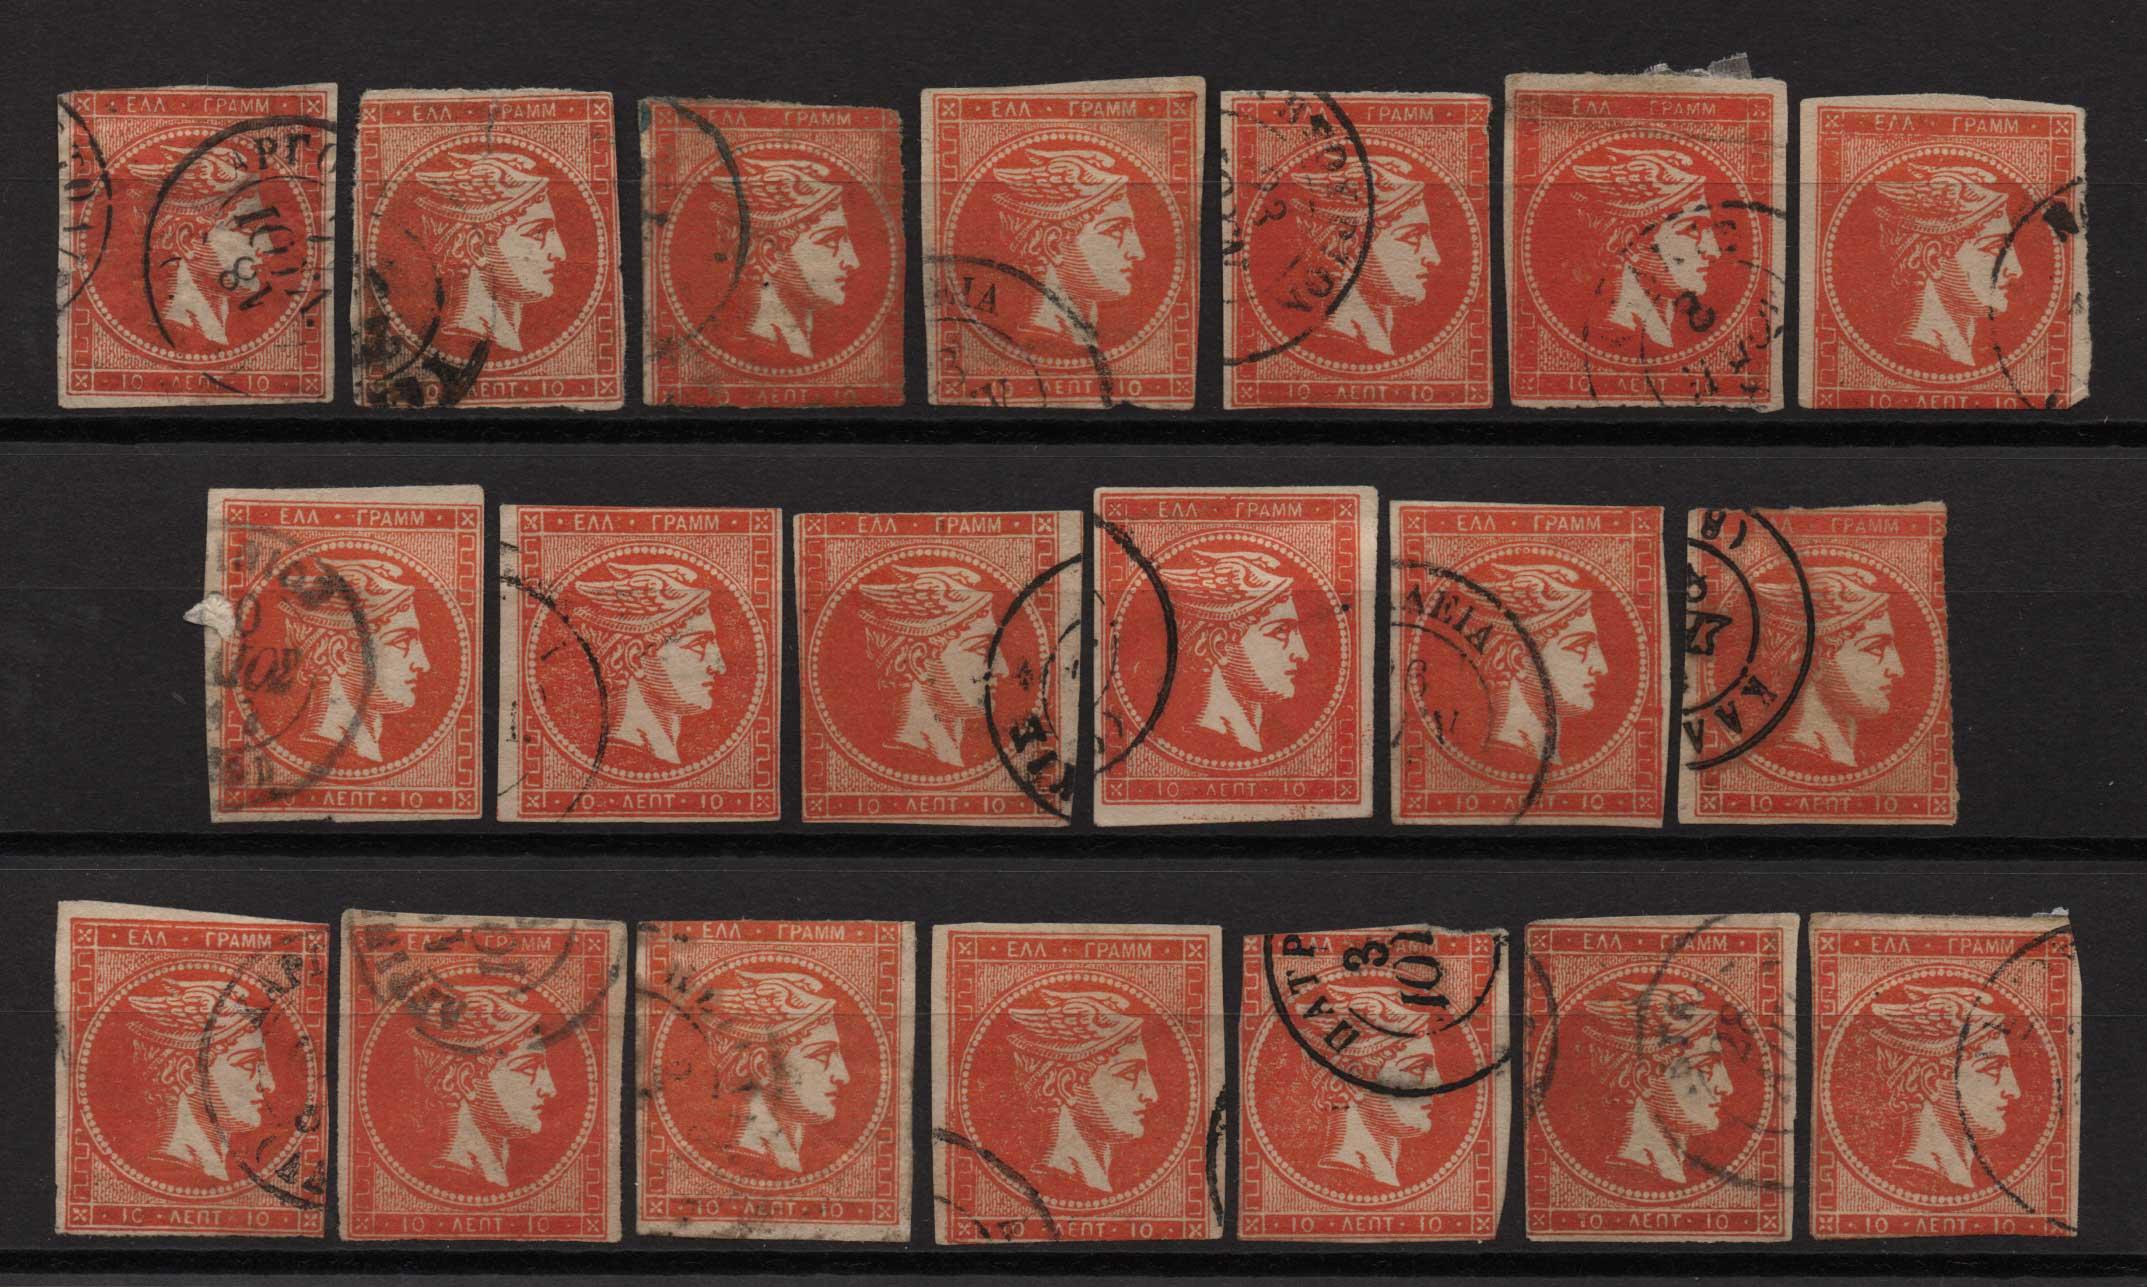 Lot 11 - -  LARGE HERMES HEAD large hermes head -  Athens Auctions Public Auction 67 General Stamp Sale